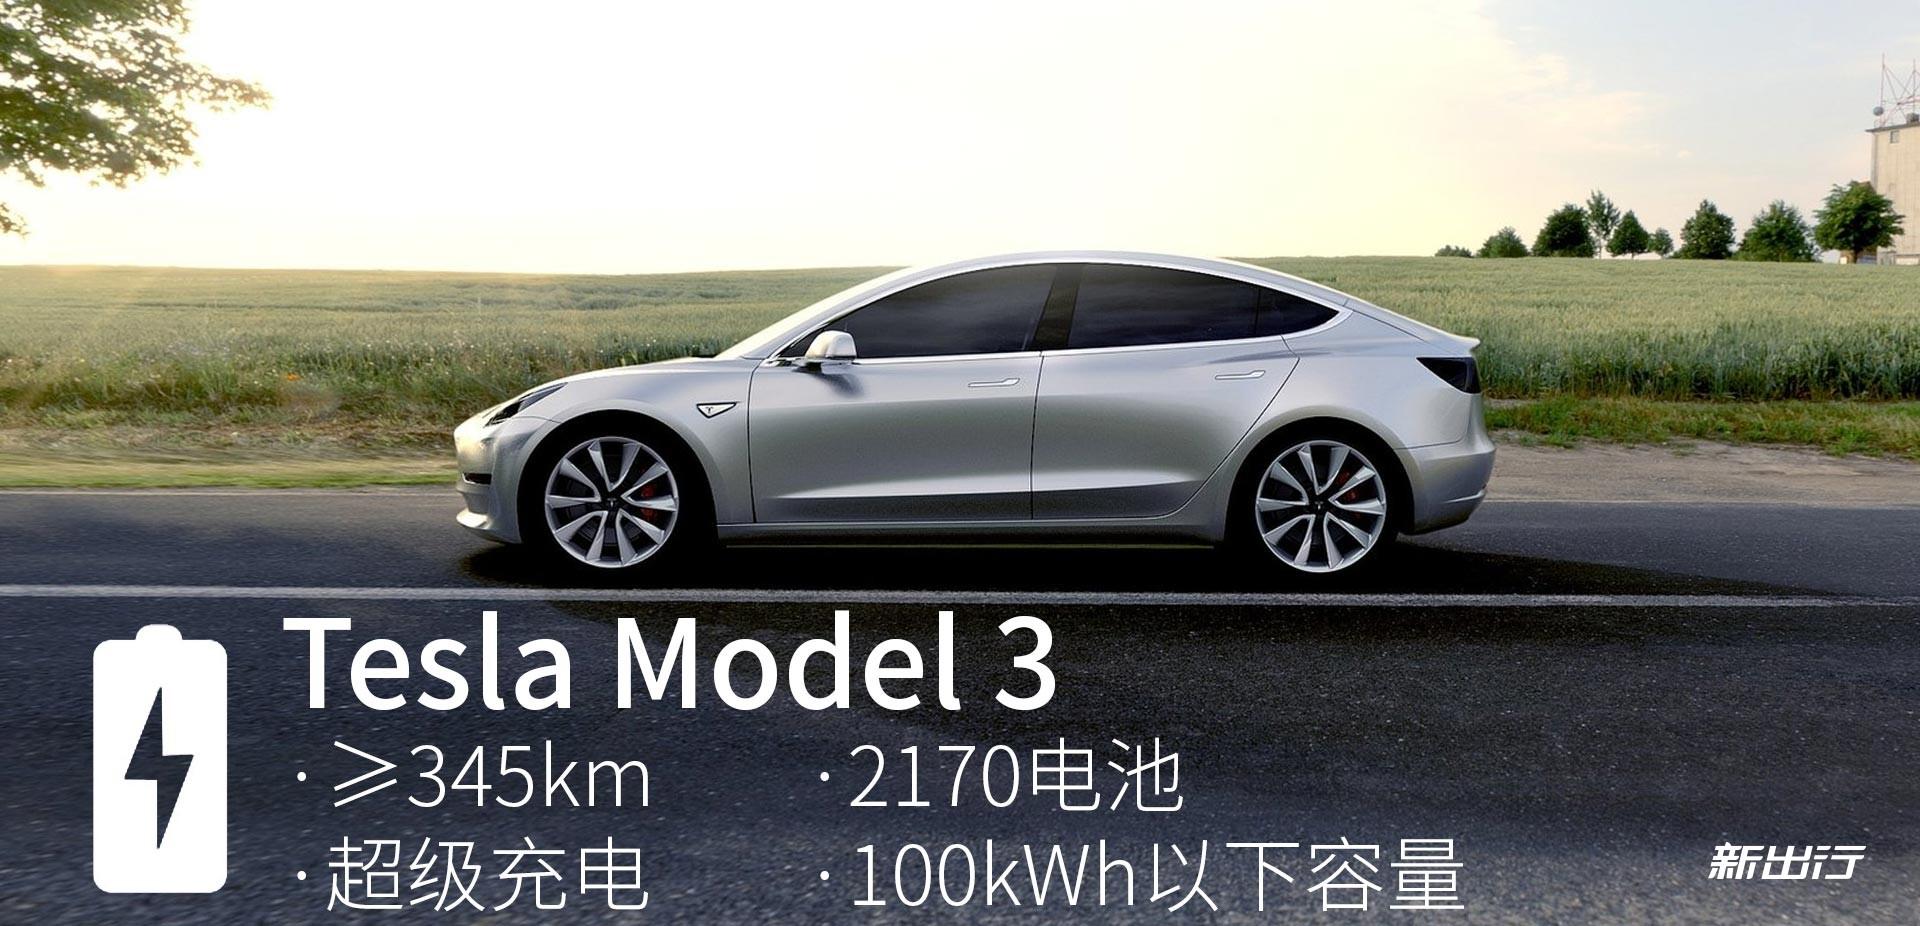 「Model 3 官方确认信息」